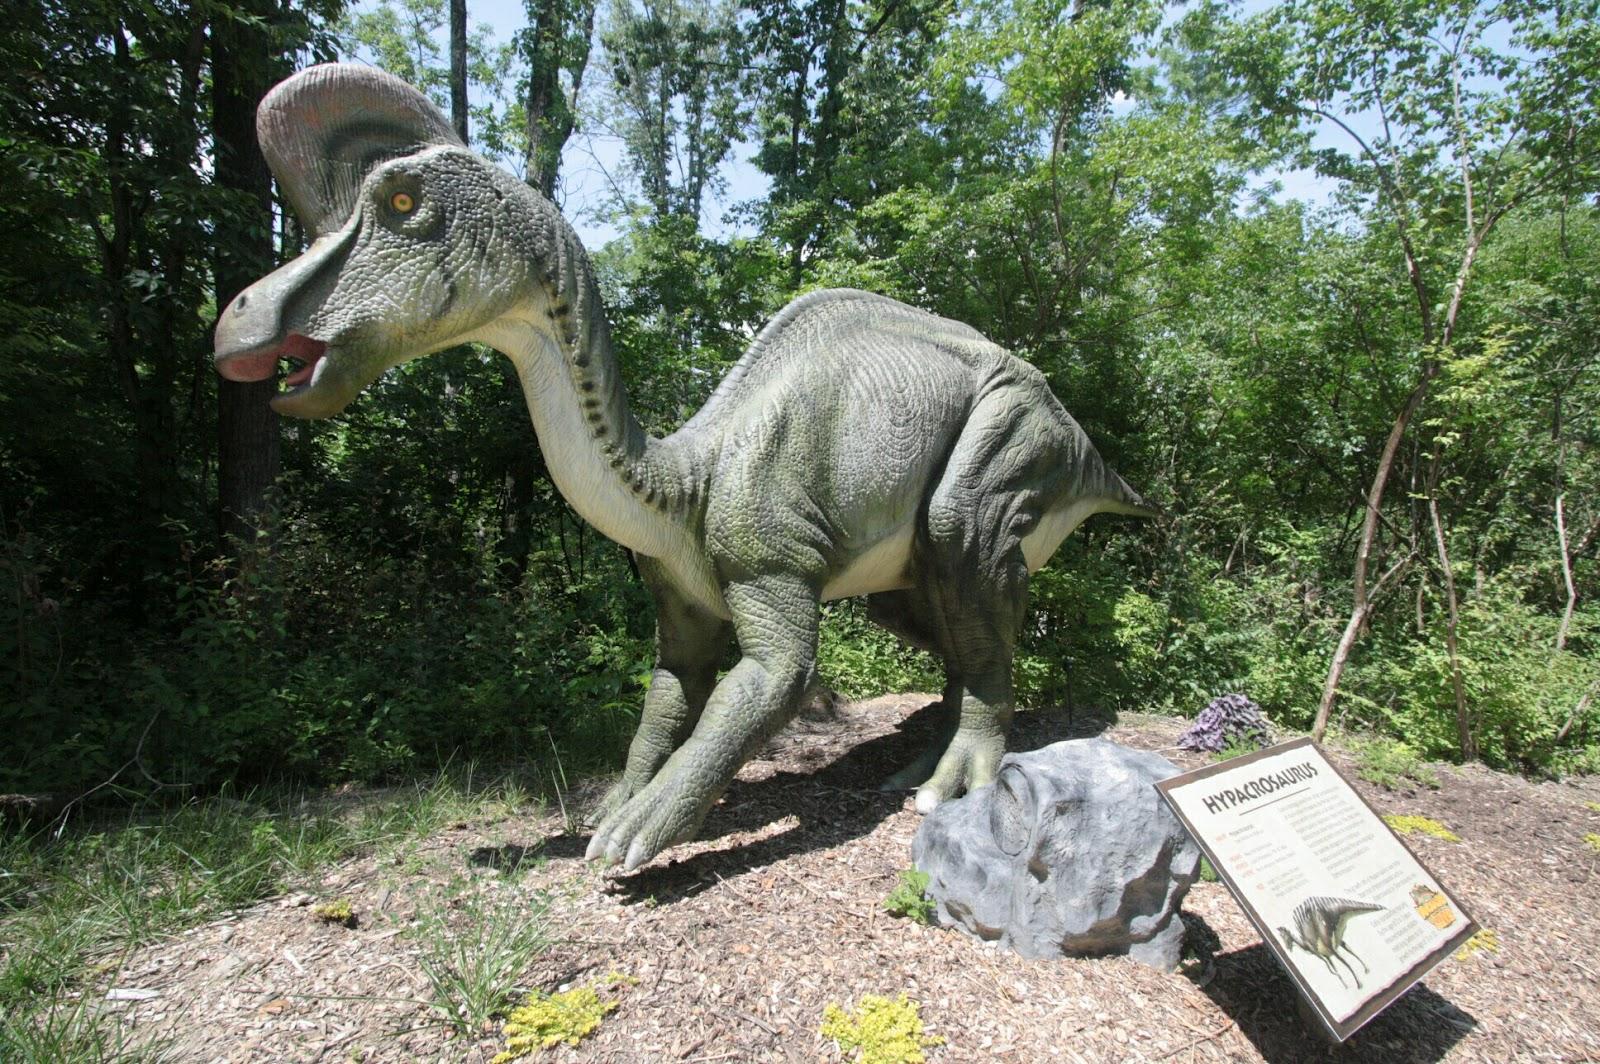 R Dinosaurs Alive Dinosaurs Alive - Trip...